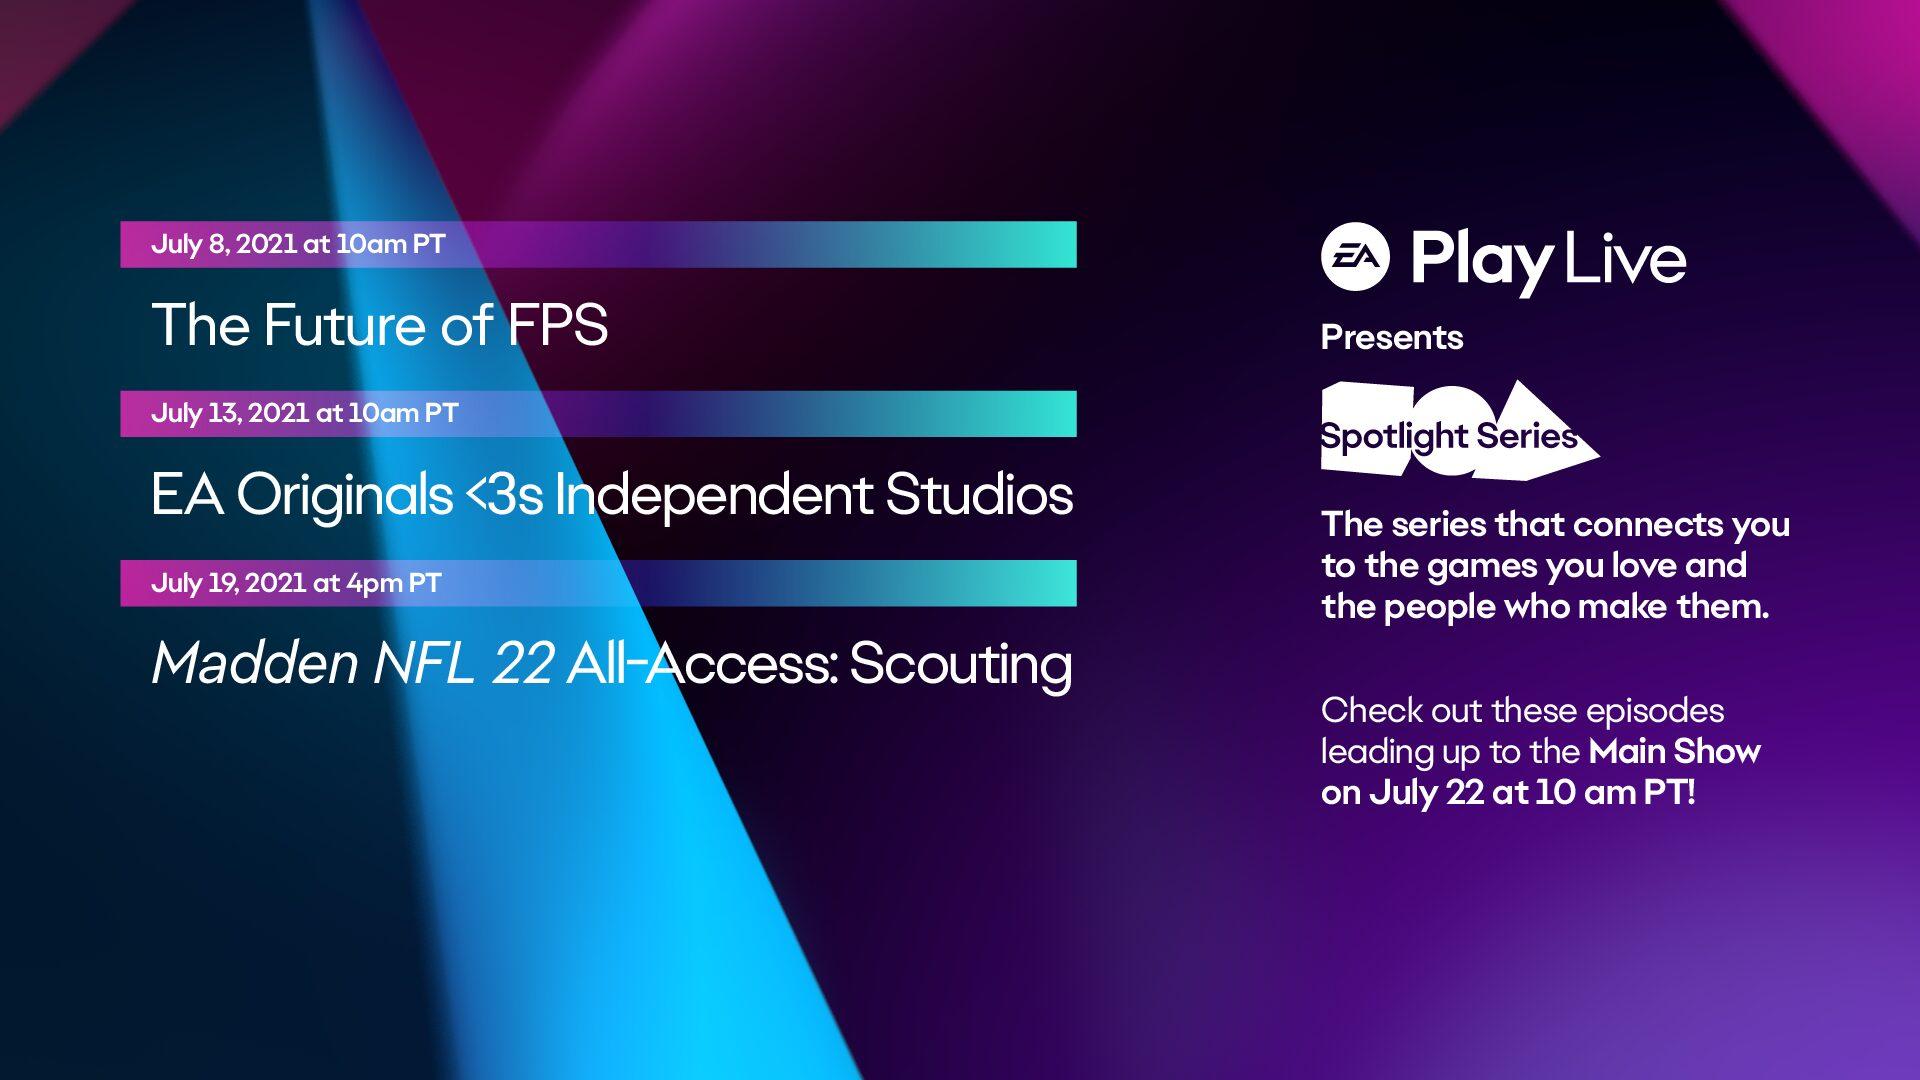 EA Play Live 2021 schedule